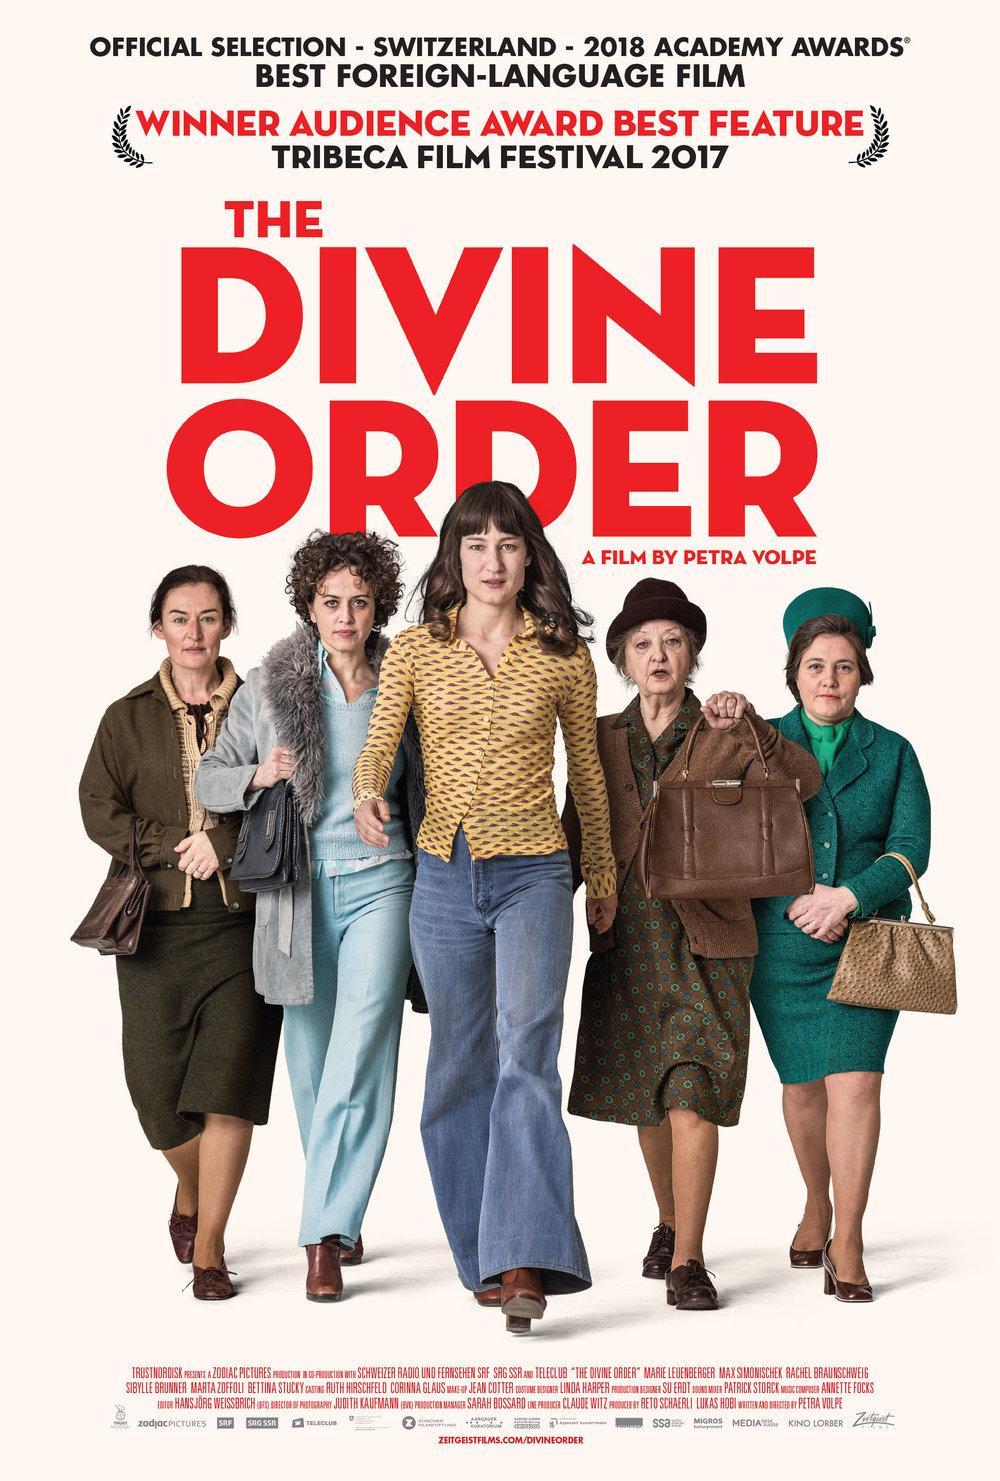 DivineOrder_US_poster_1944x2880.jpg